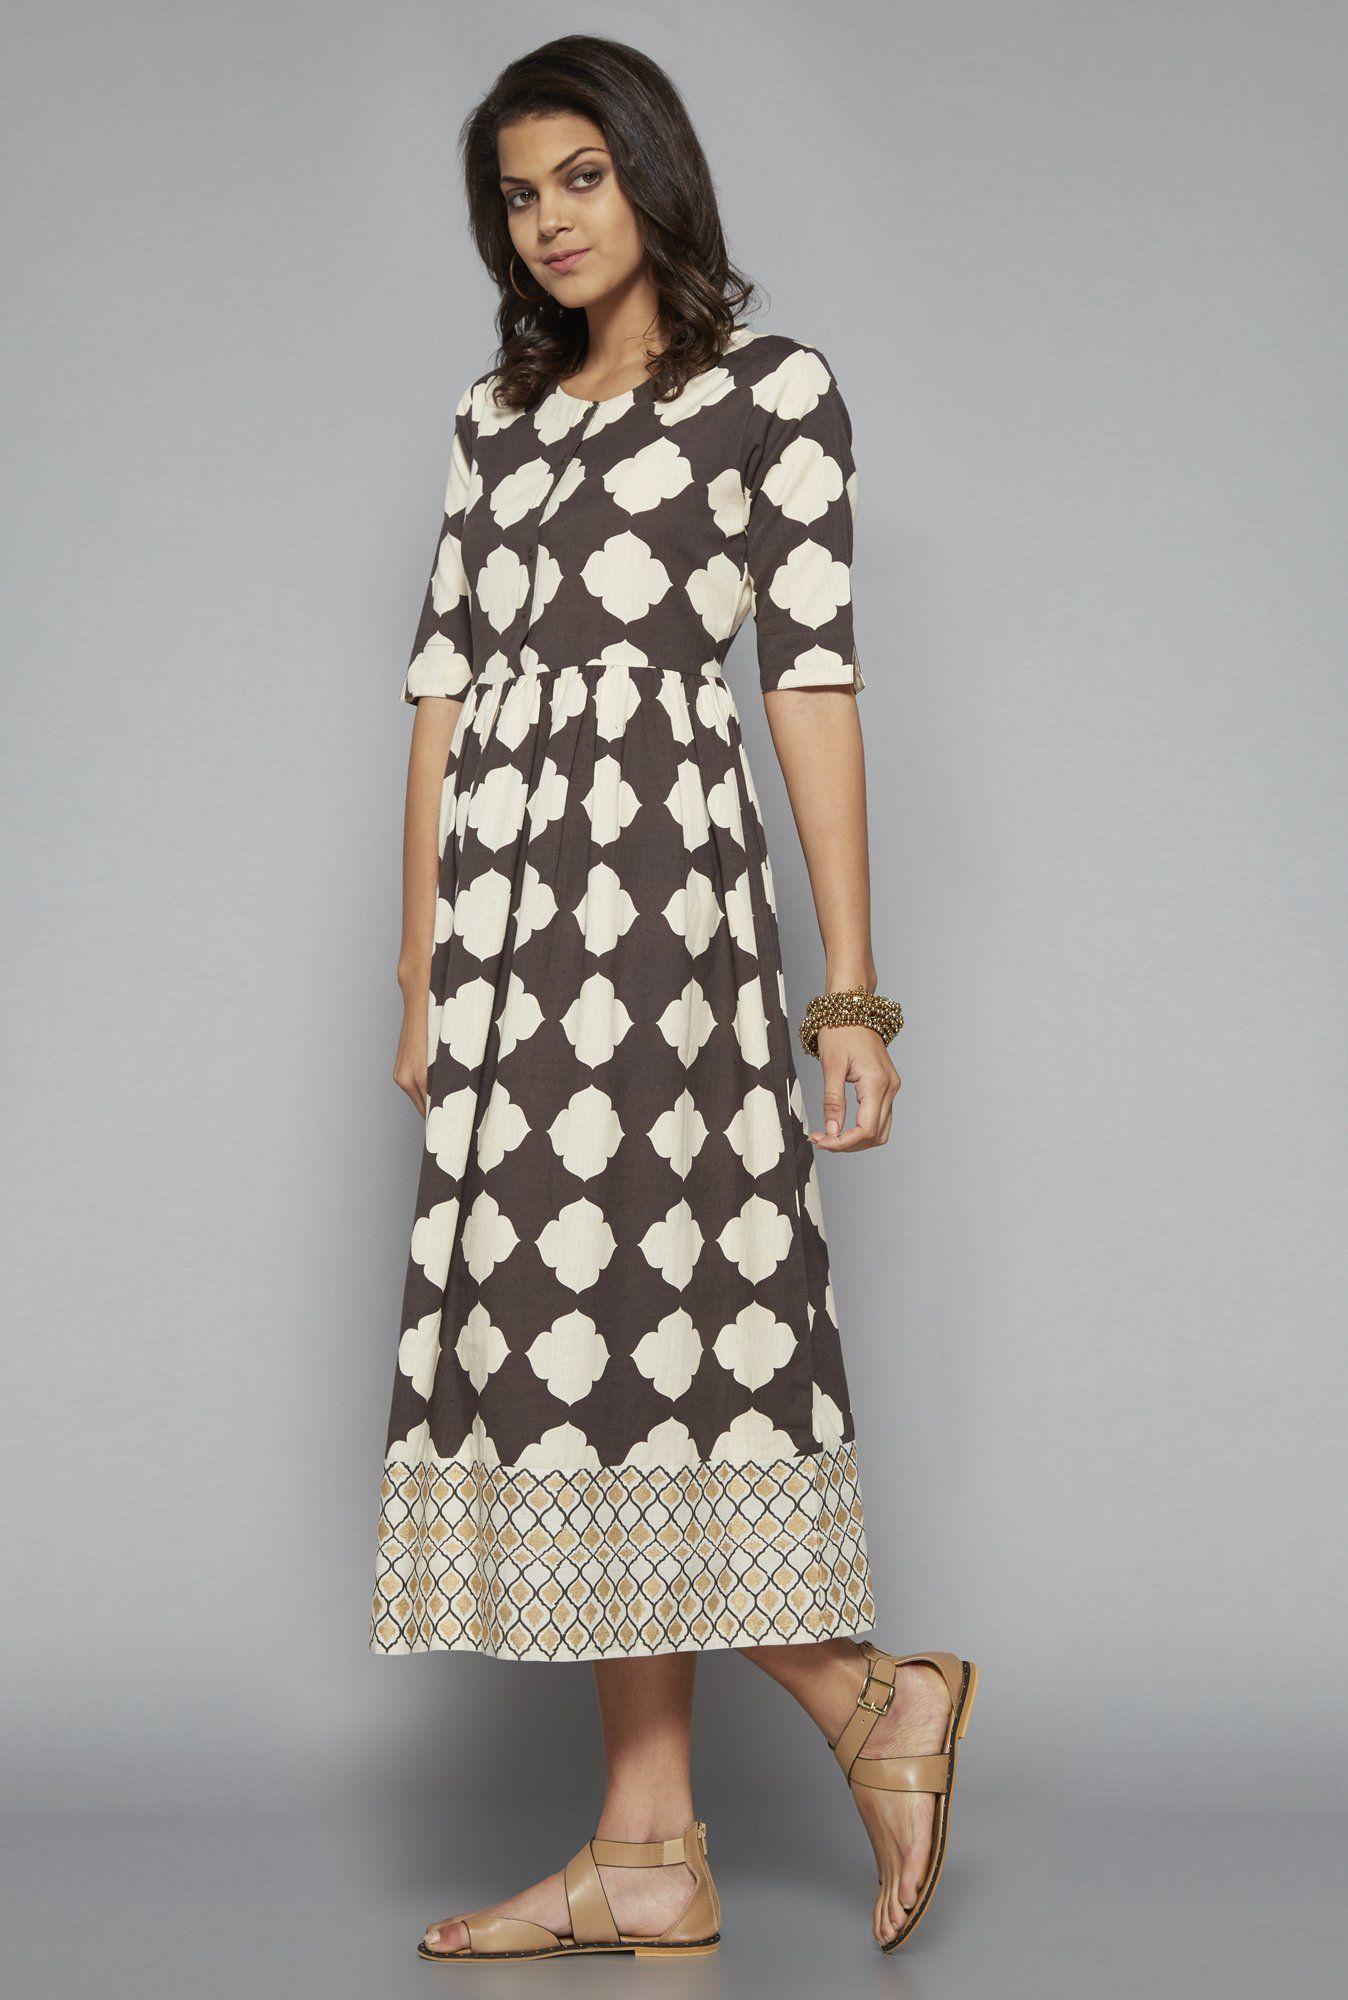 9b823f754c3 Bombay Paisley by Westside Grey Dress